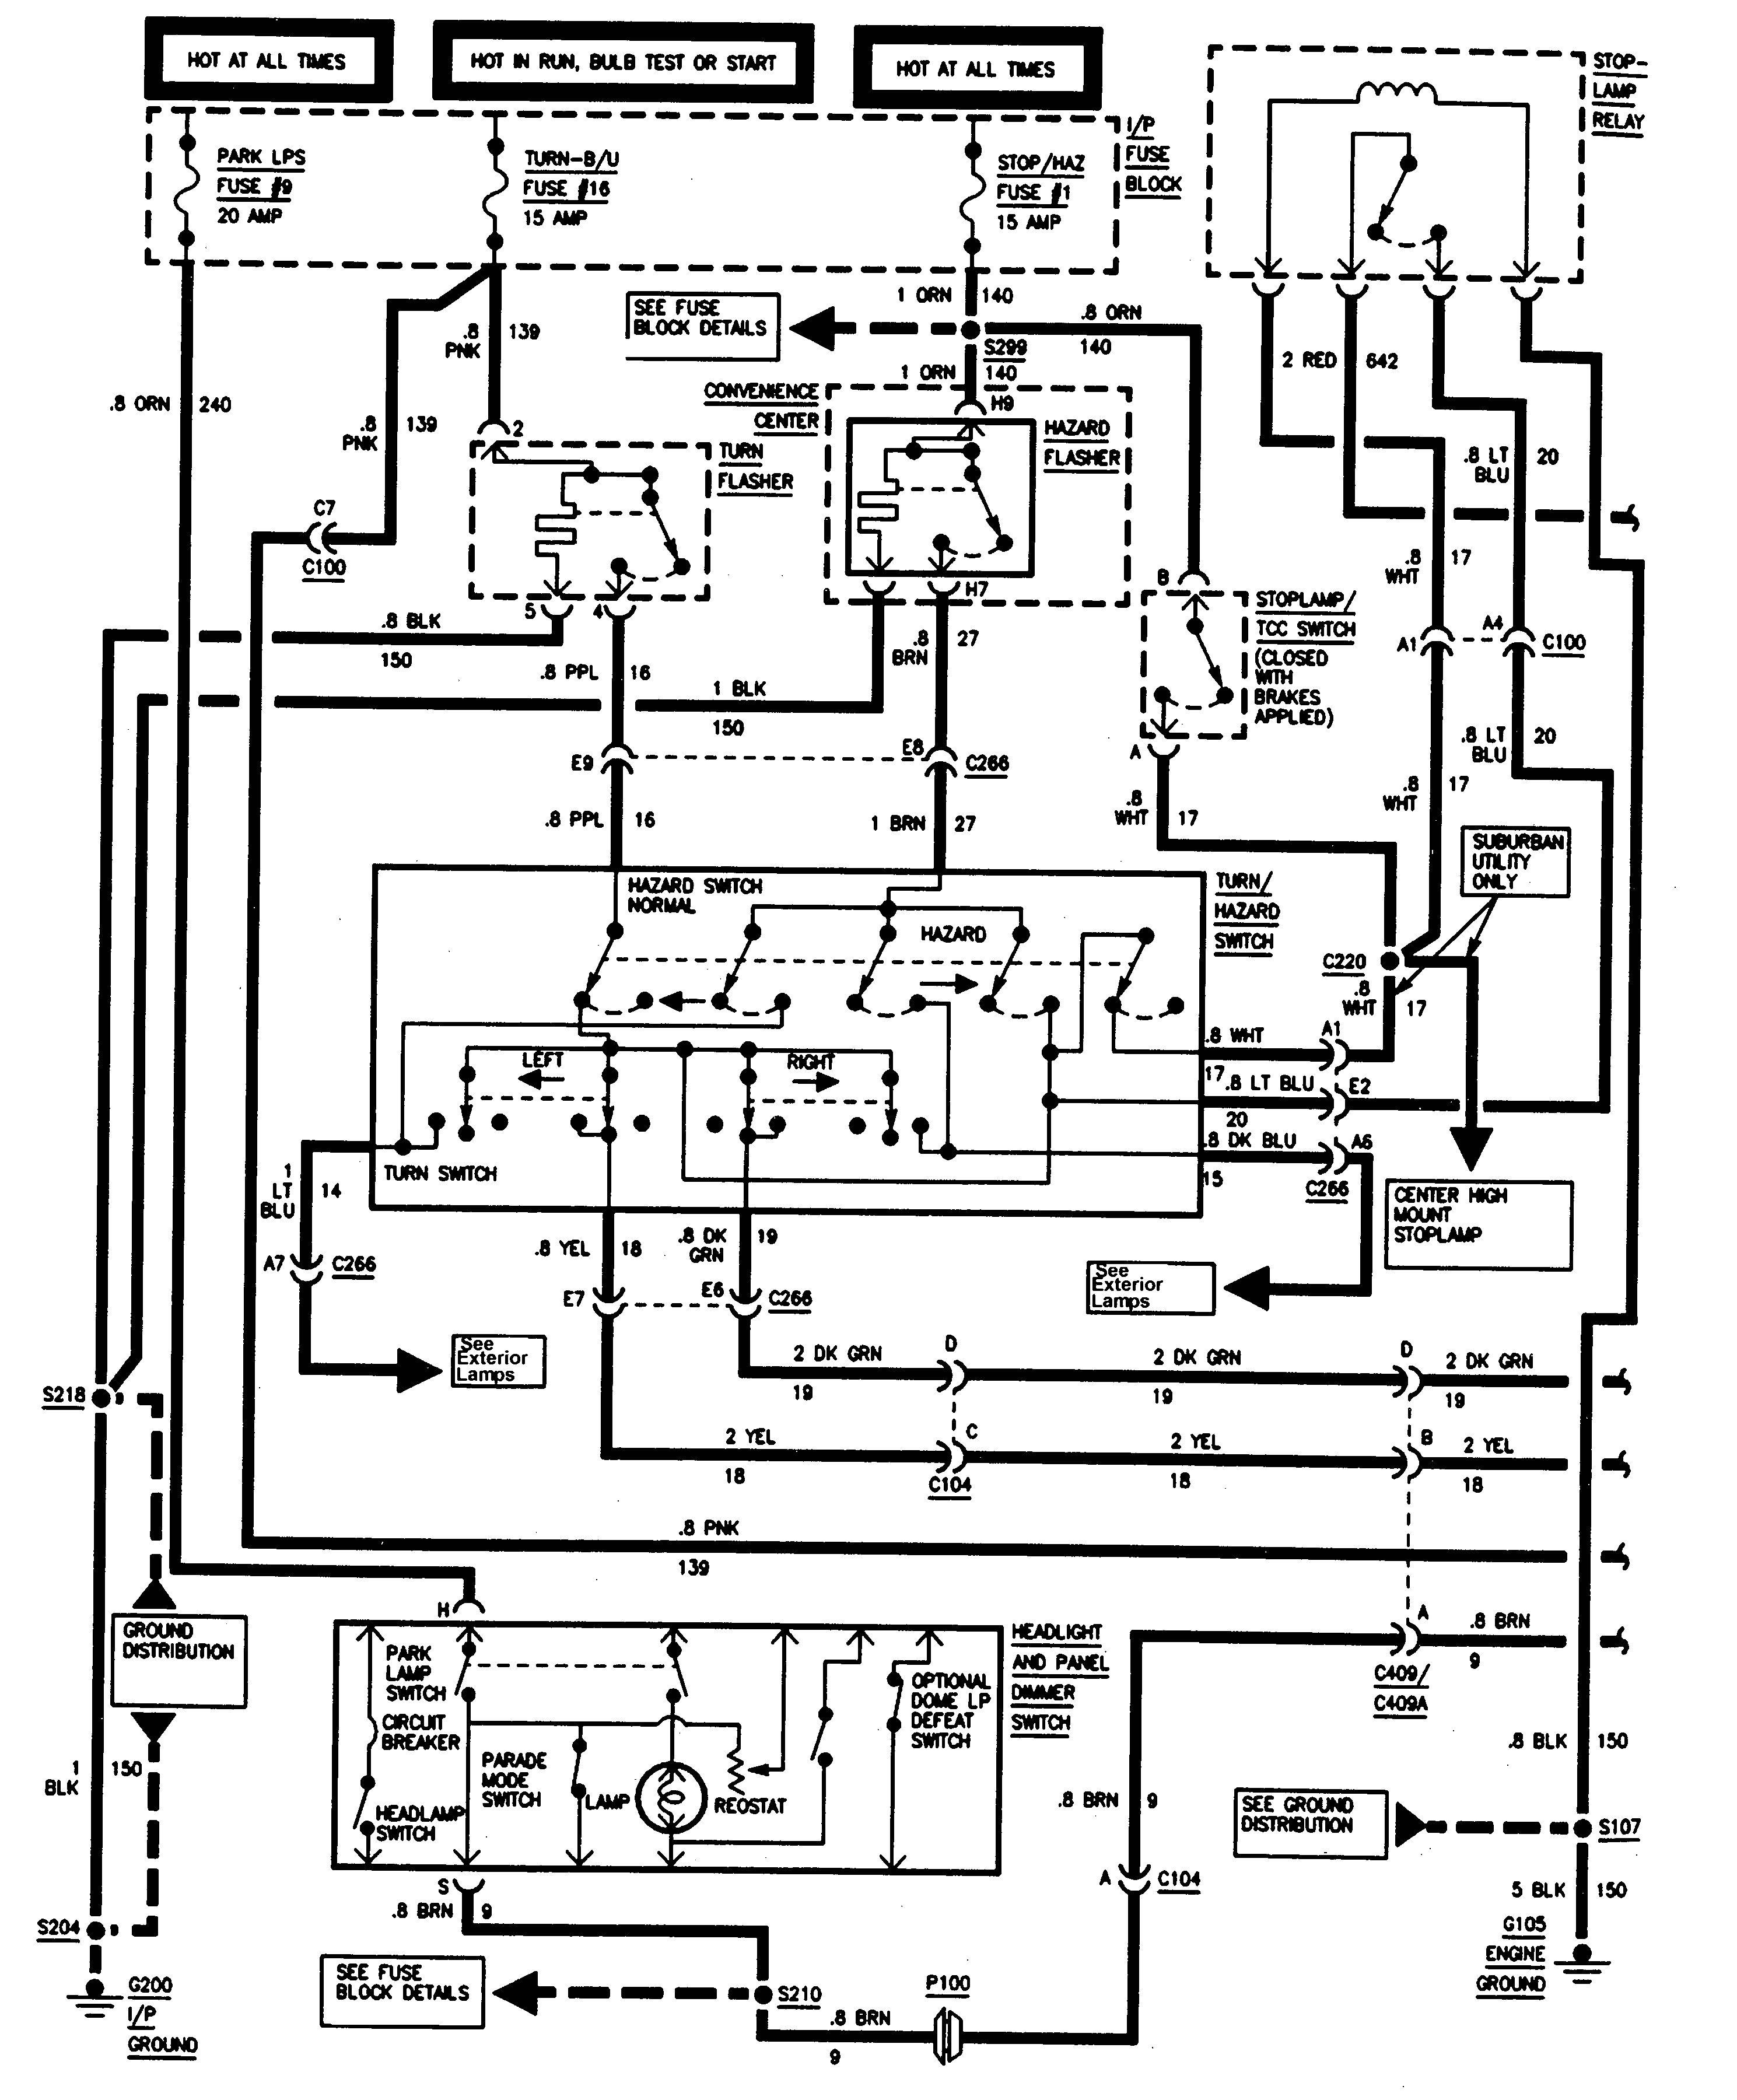 gmc truck trailer wiring diagrams gmc sierra 1500  1995      wiring diagrams     trailer towing  wiring diagrams     trailer towing